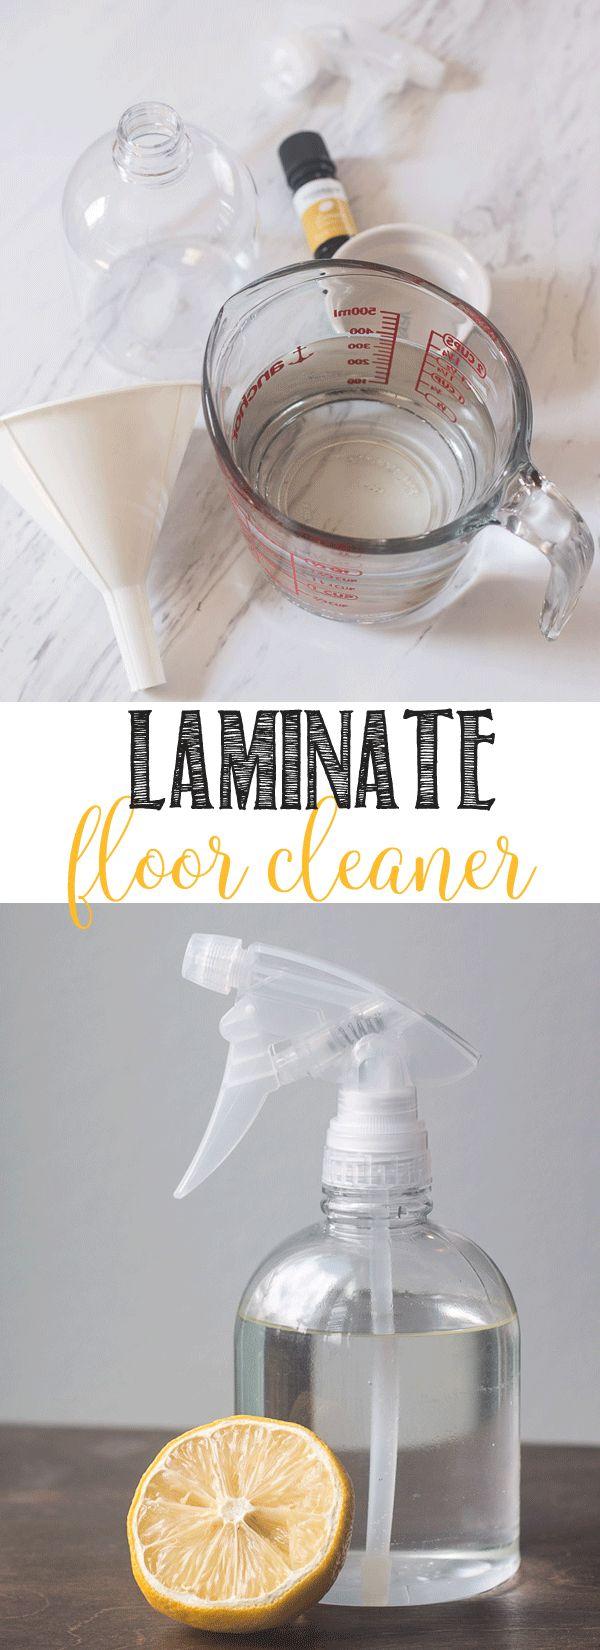 best 25 floor cleaner vinegar ideas on pinterest diy wood floor cleaning diy floor cleaning. Black Bedroom Furniture Sets. Home Design Ideas